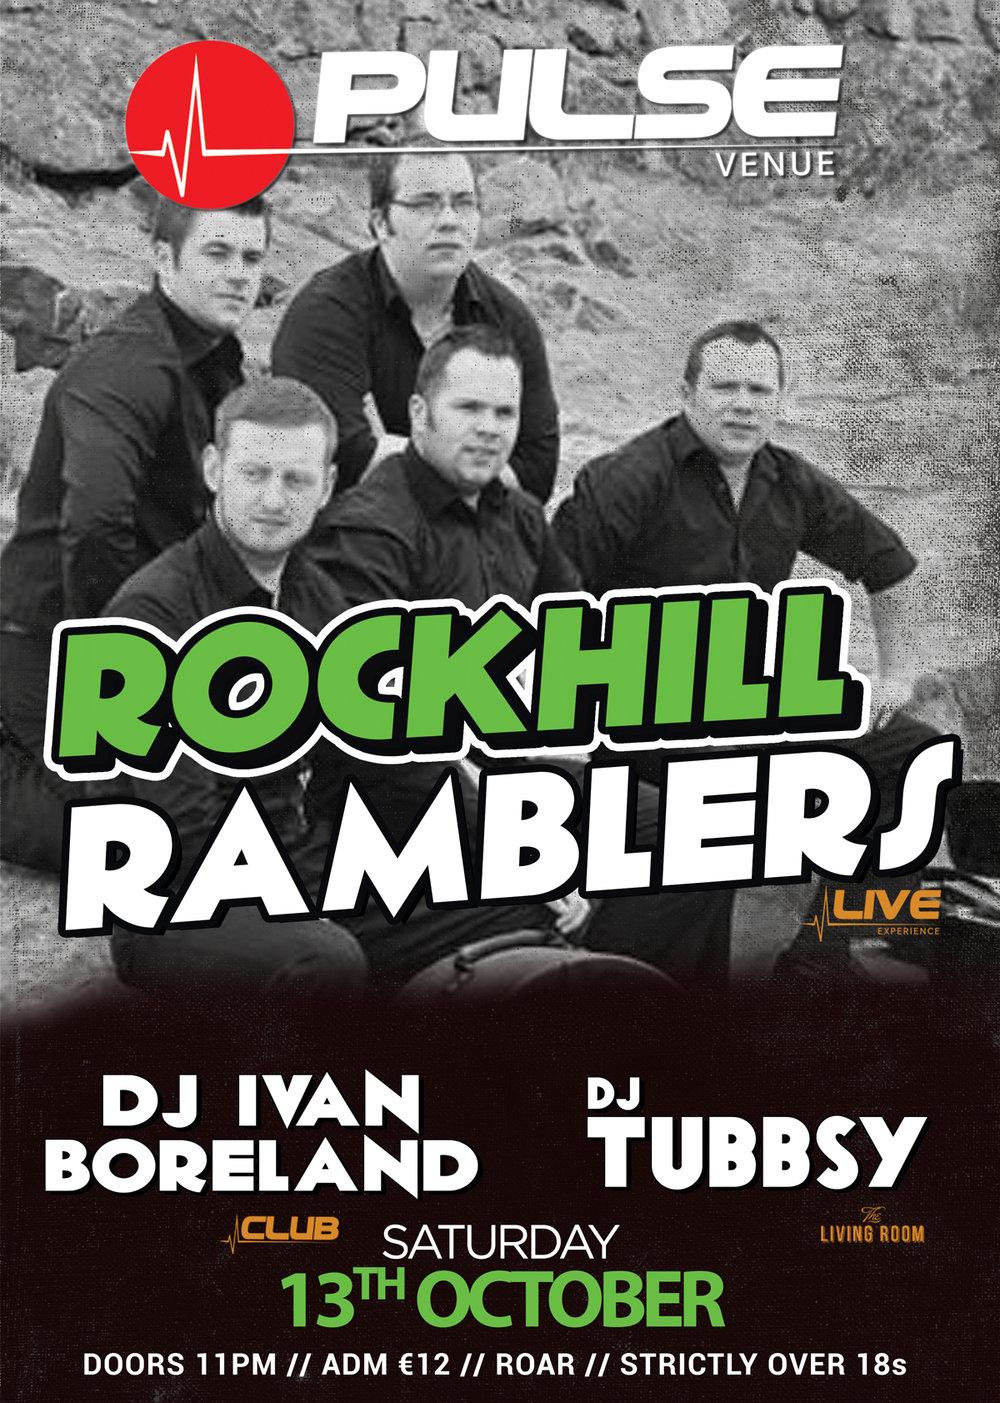 pulse-venue---rockhill-ramblers---IVAN-tubbsy---sat-oct-13-2018.jpg